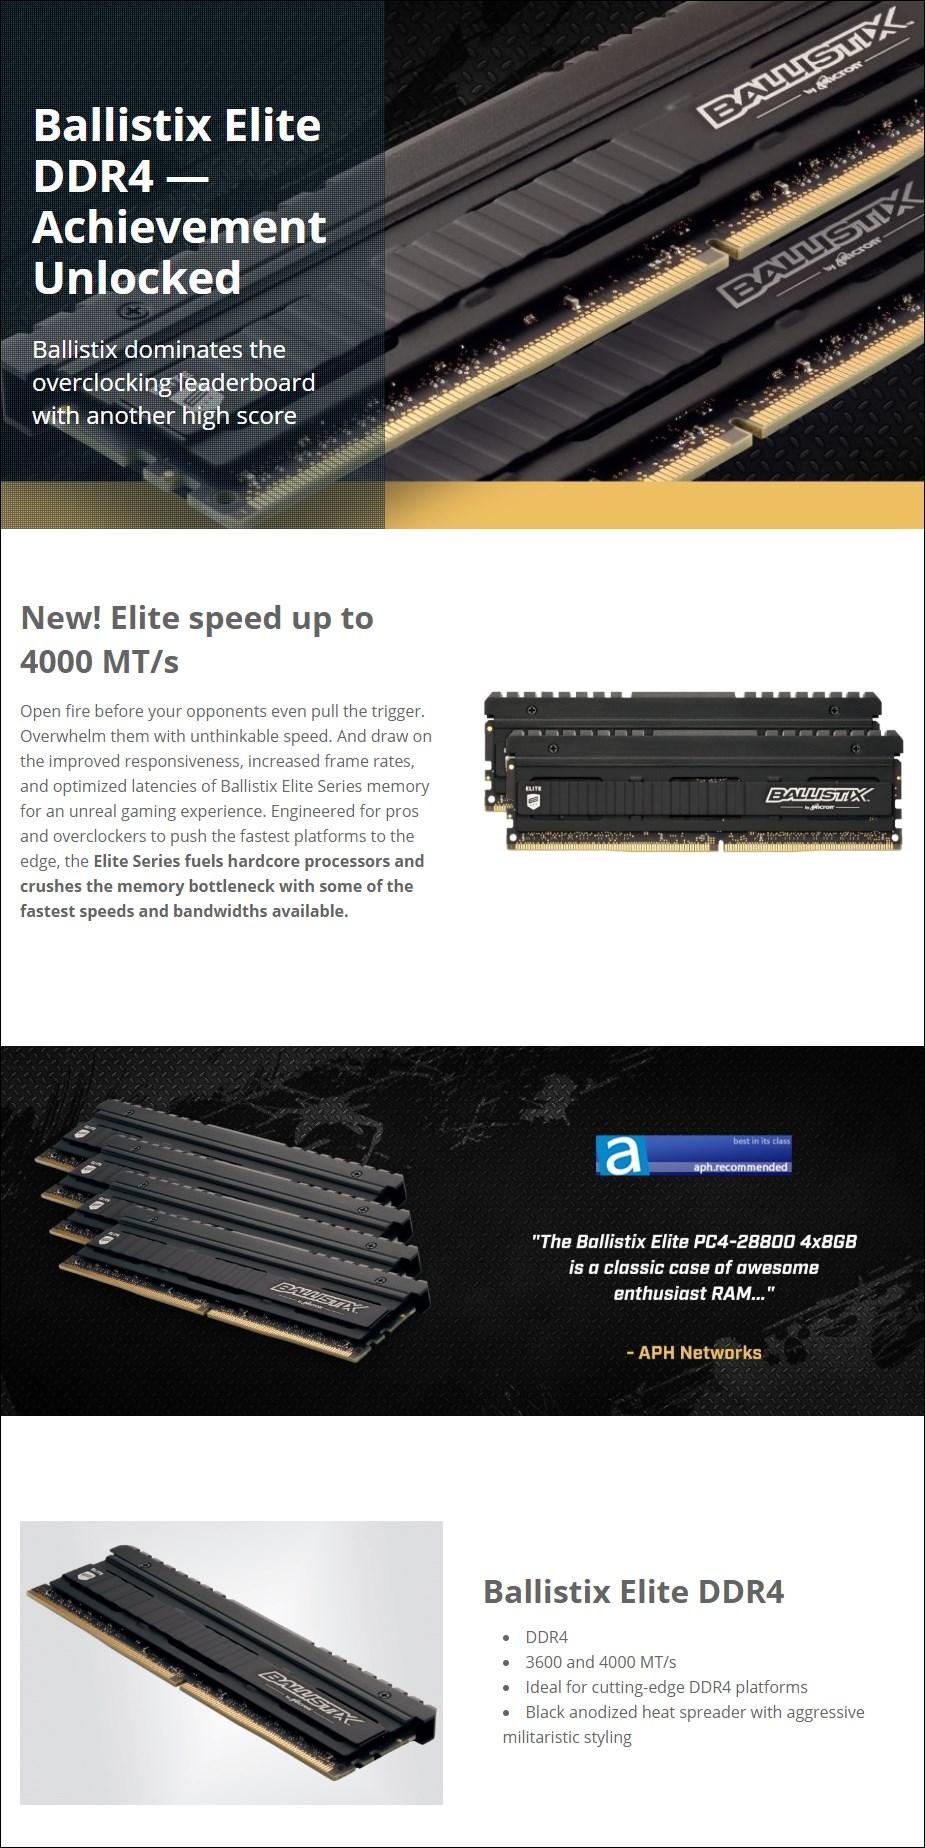 Crucial Ballistix Elite 16GB (2x 8GB) DDR4 4000MHz Memory - Overview 1